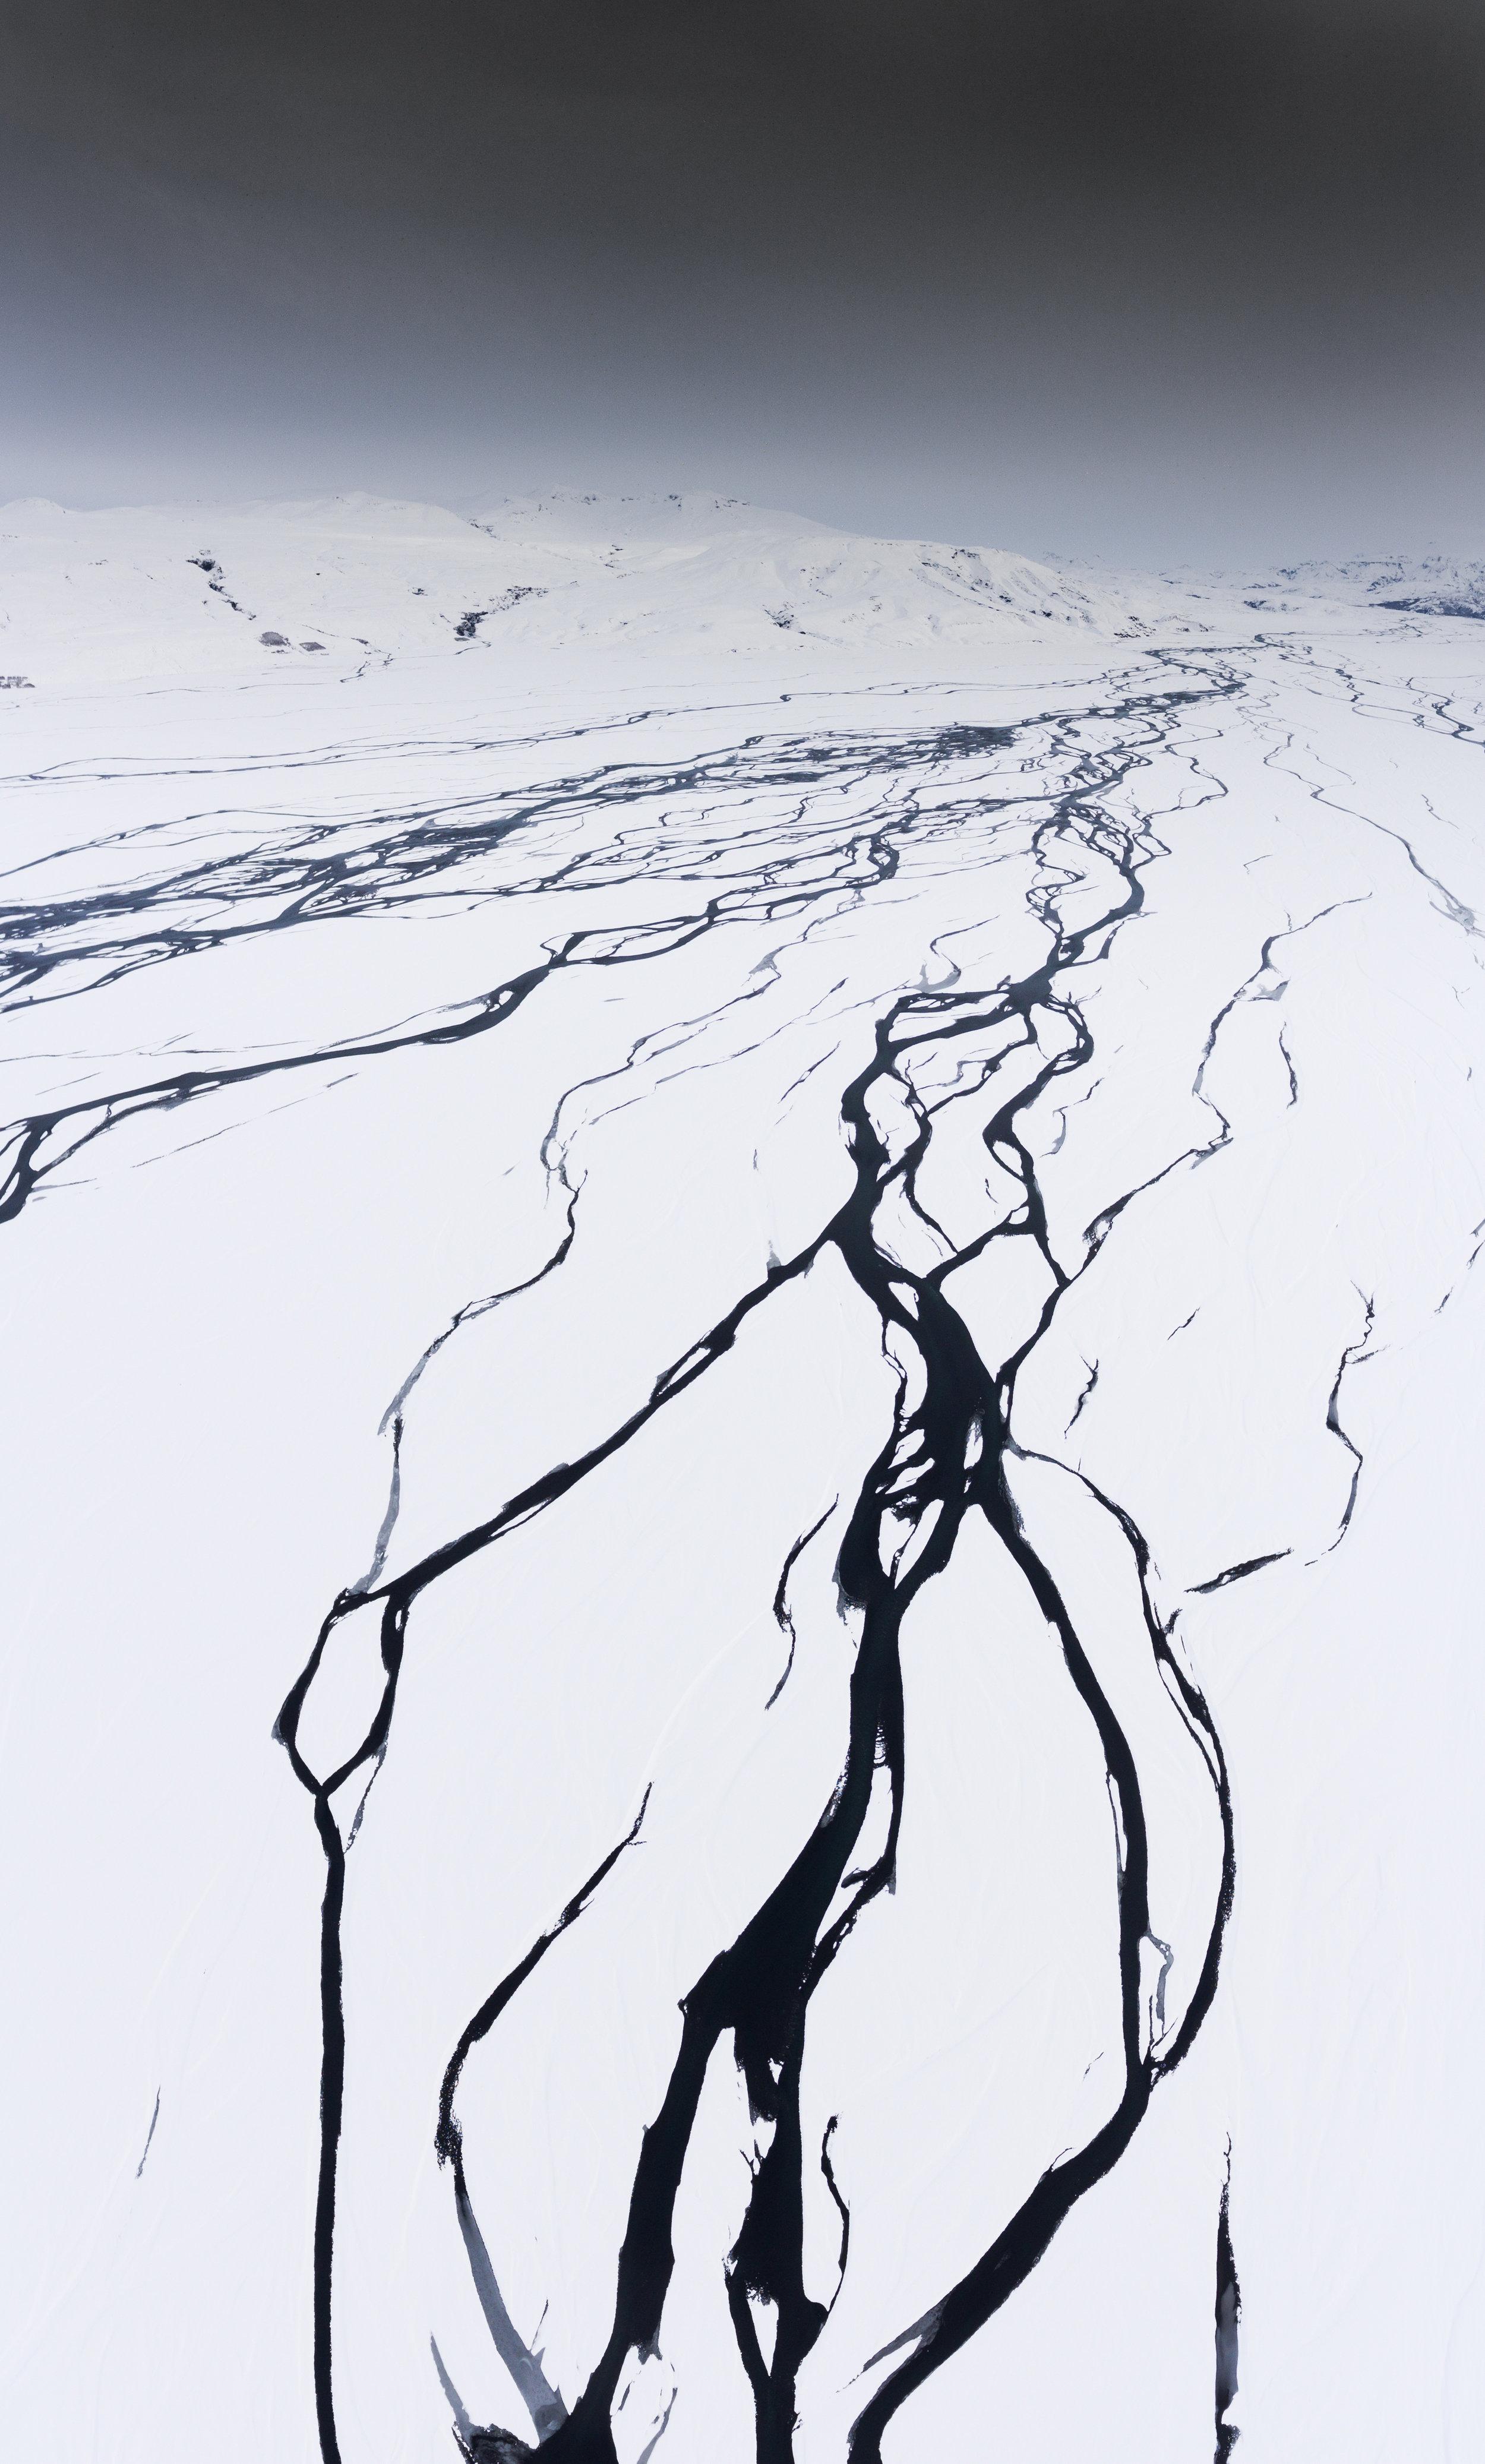 jermiah-schuster-iceland-375.jpg